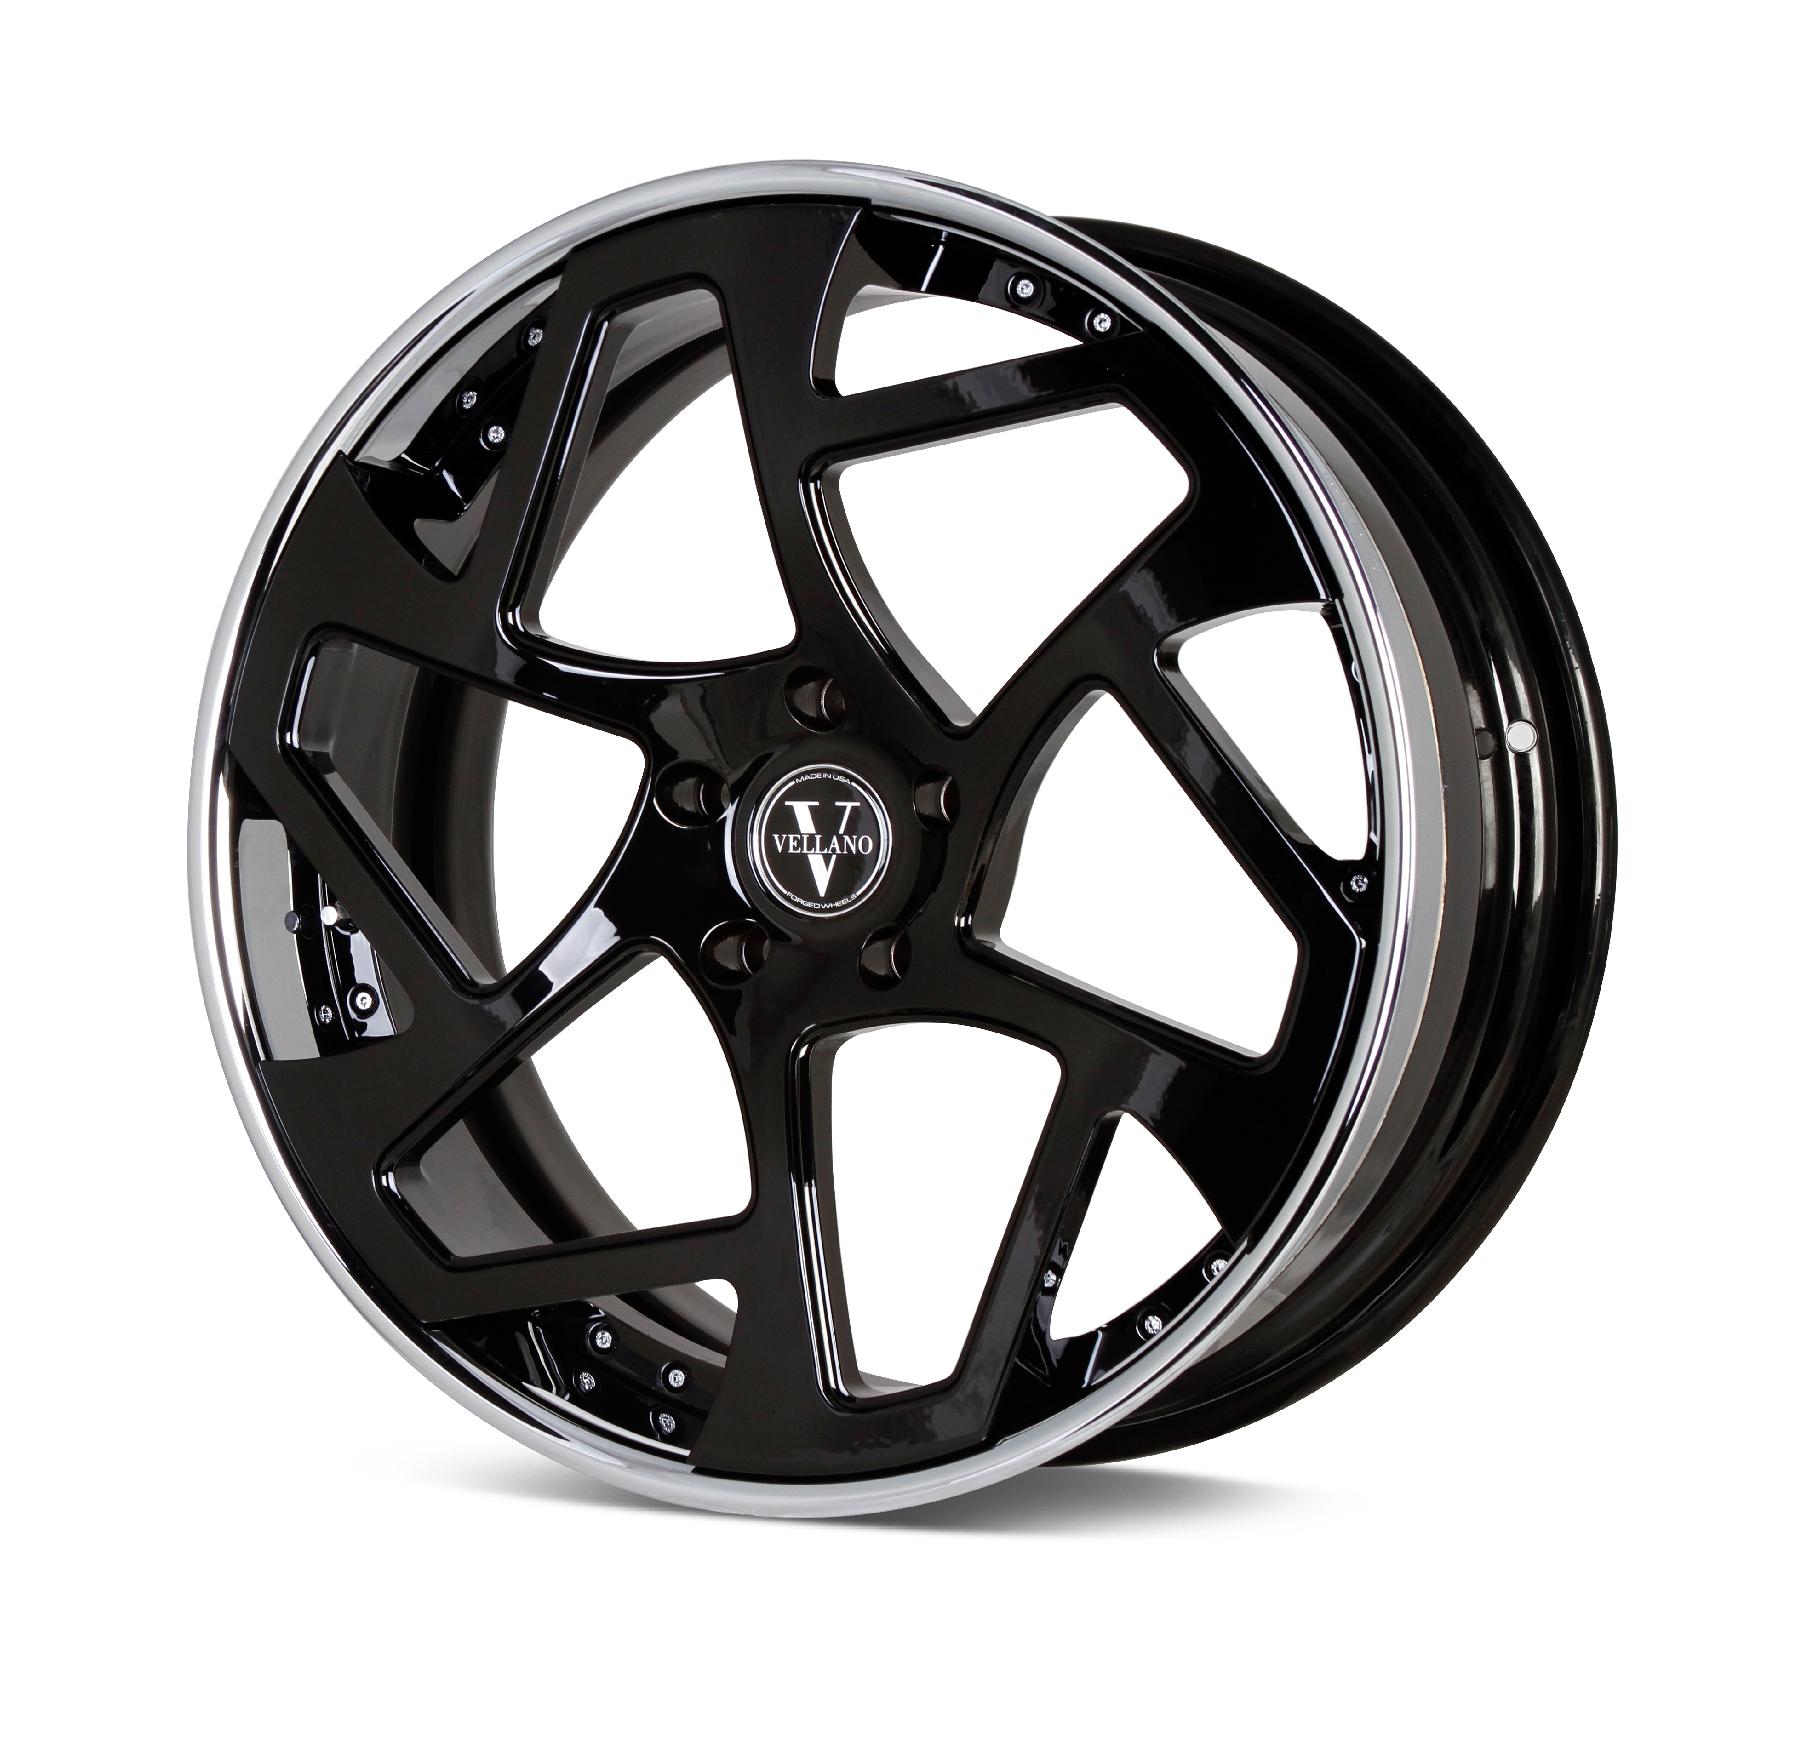 Vellano VJK forged wheels